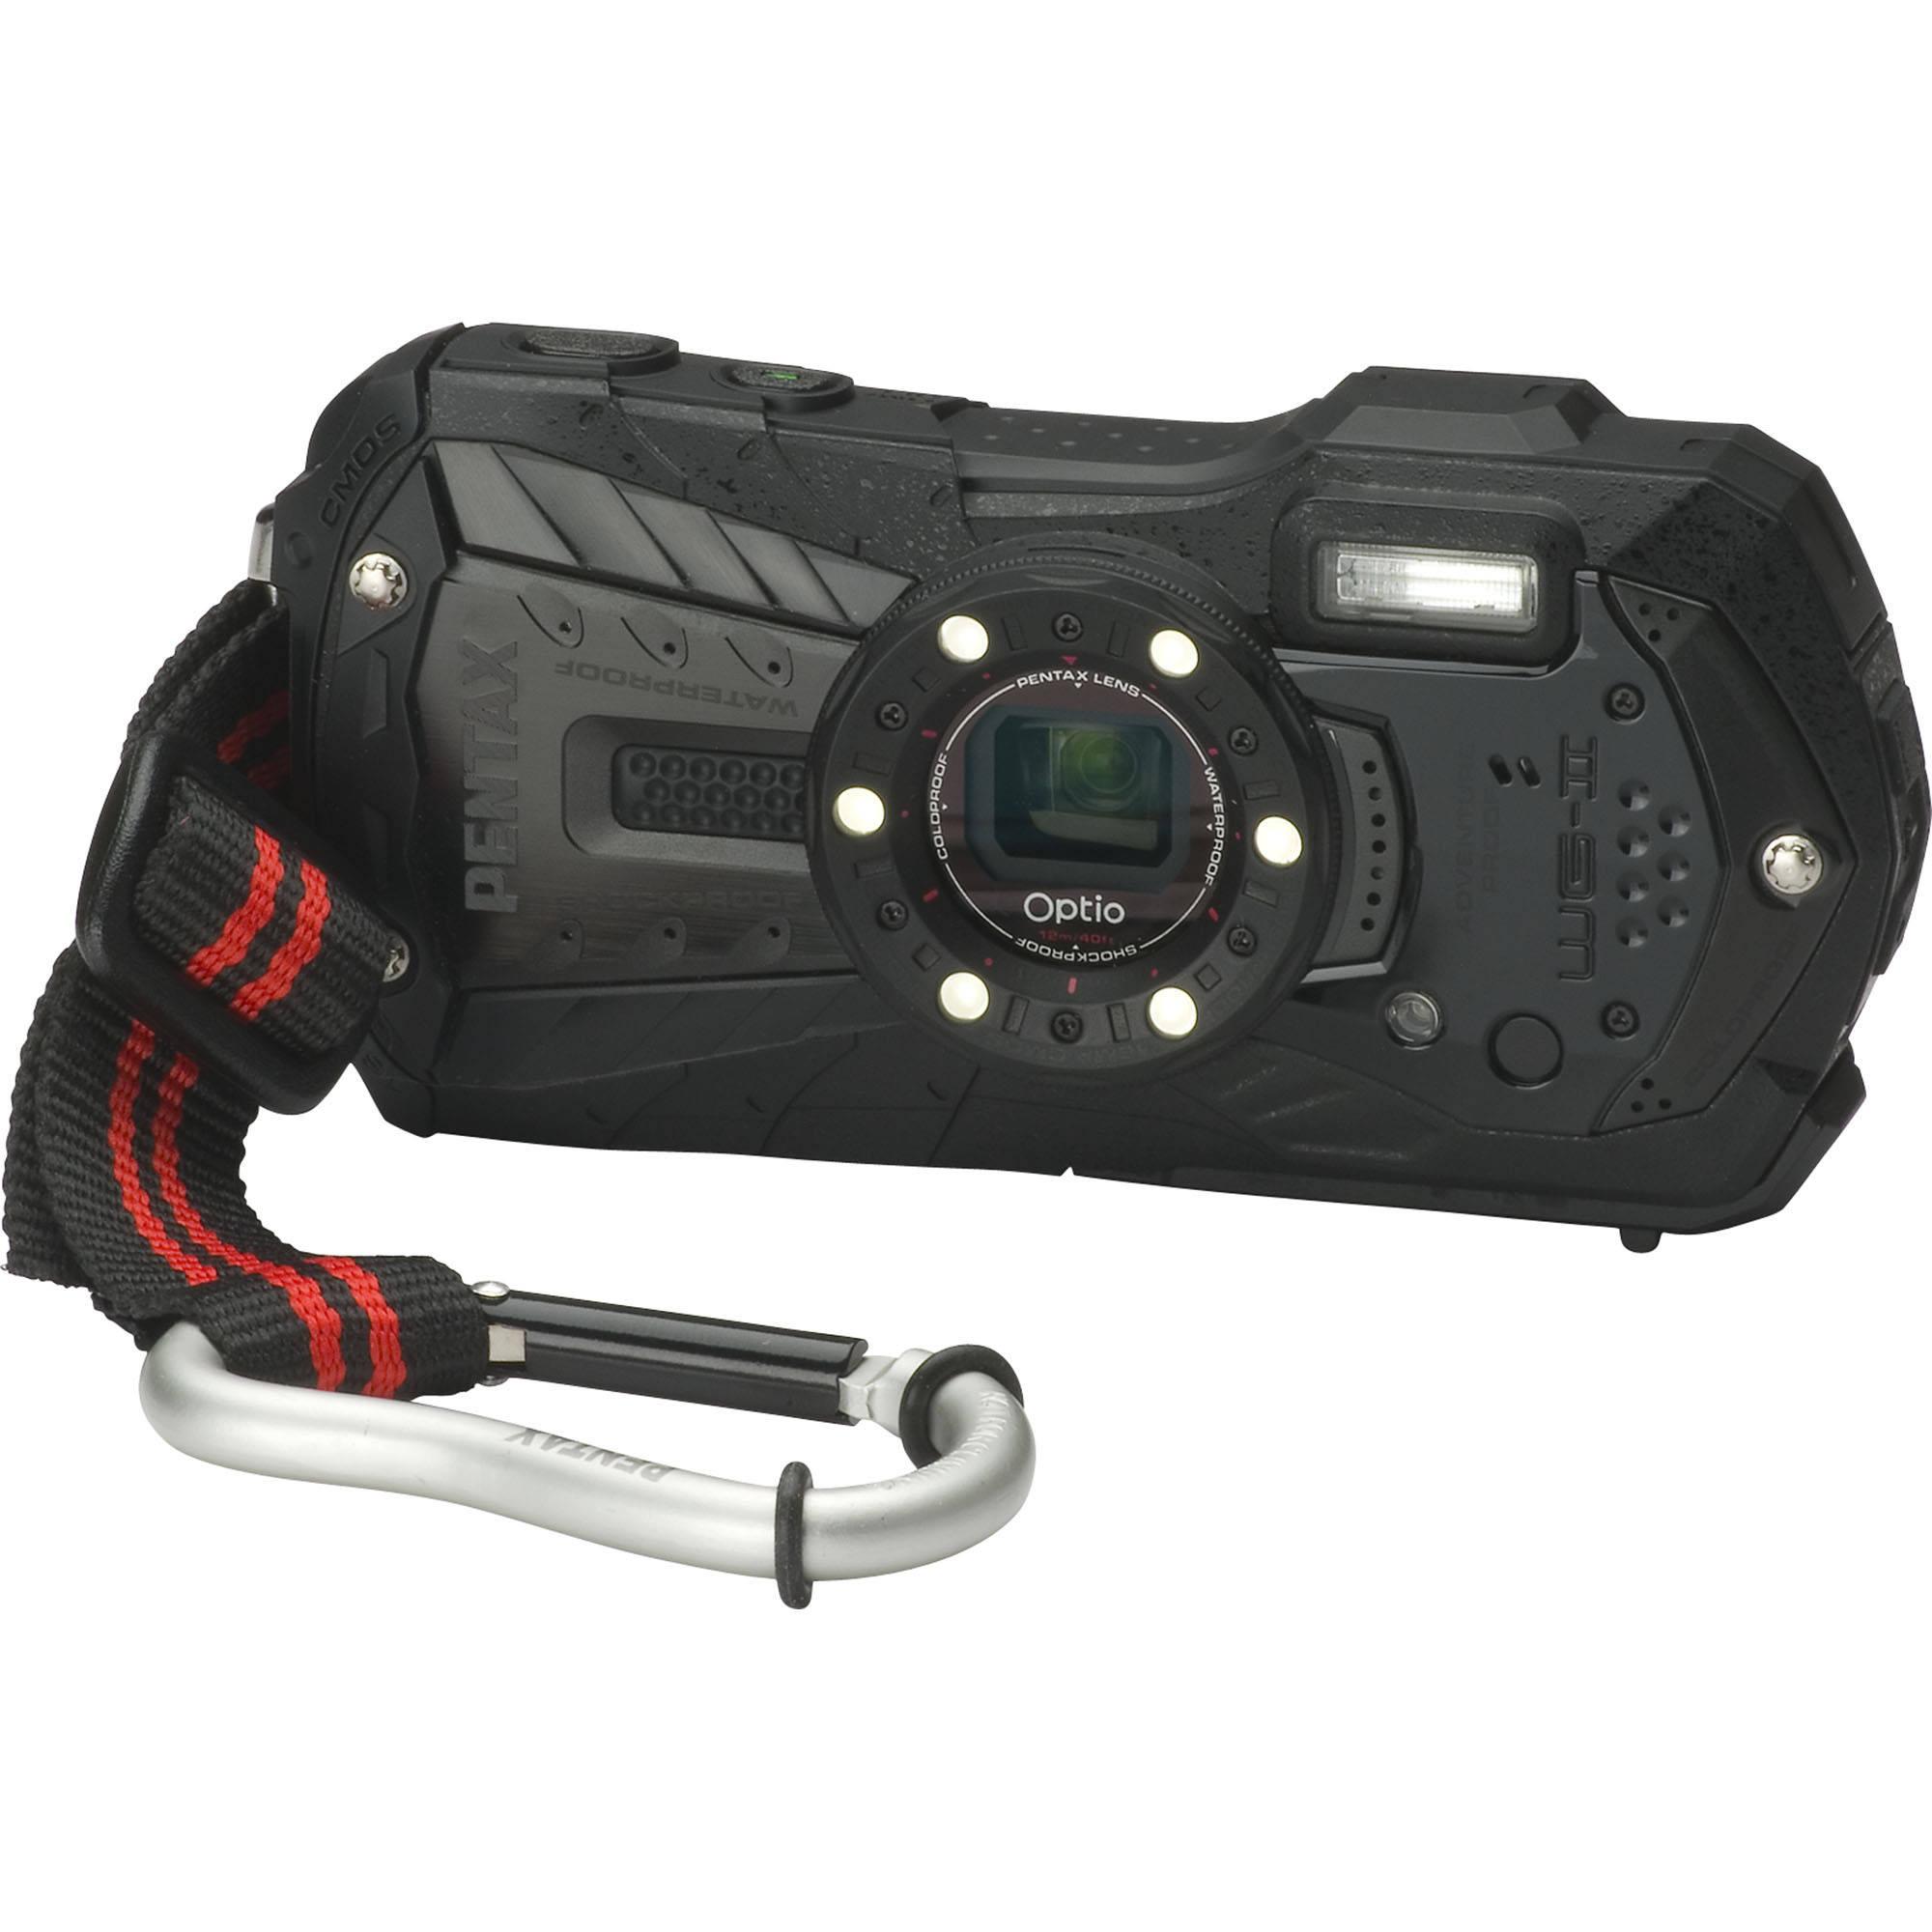 pentax optio wg 2 digital camera black 15471 b h photo video rh bhphotovideo com Pentax Optio WG-2 Charger Battery Pentax Optio WG-2